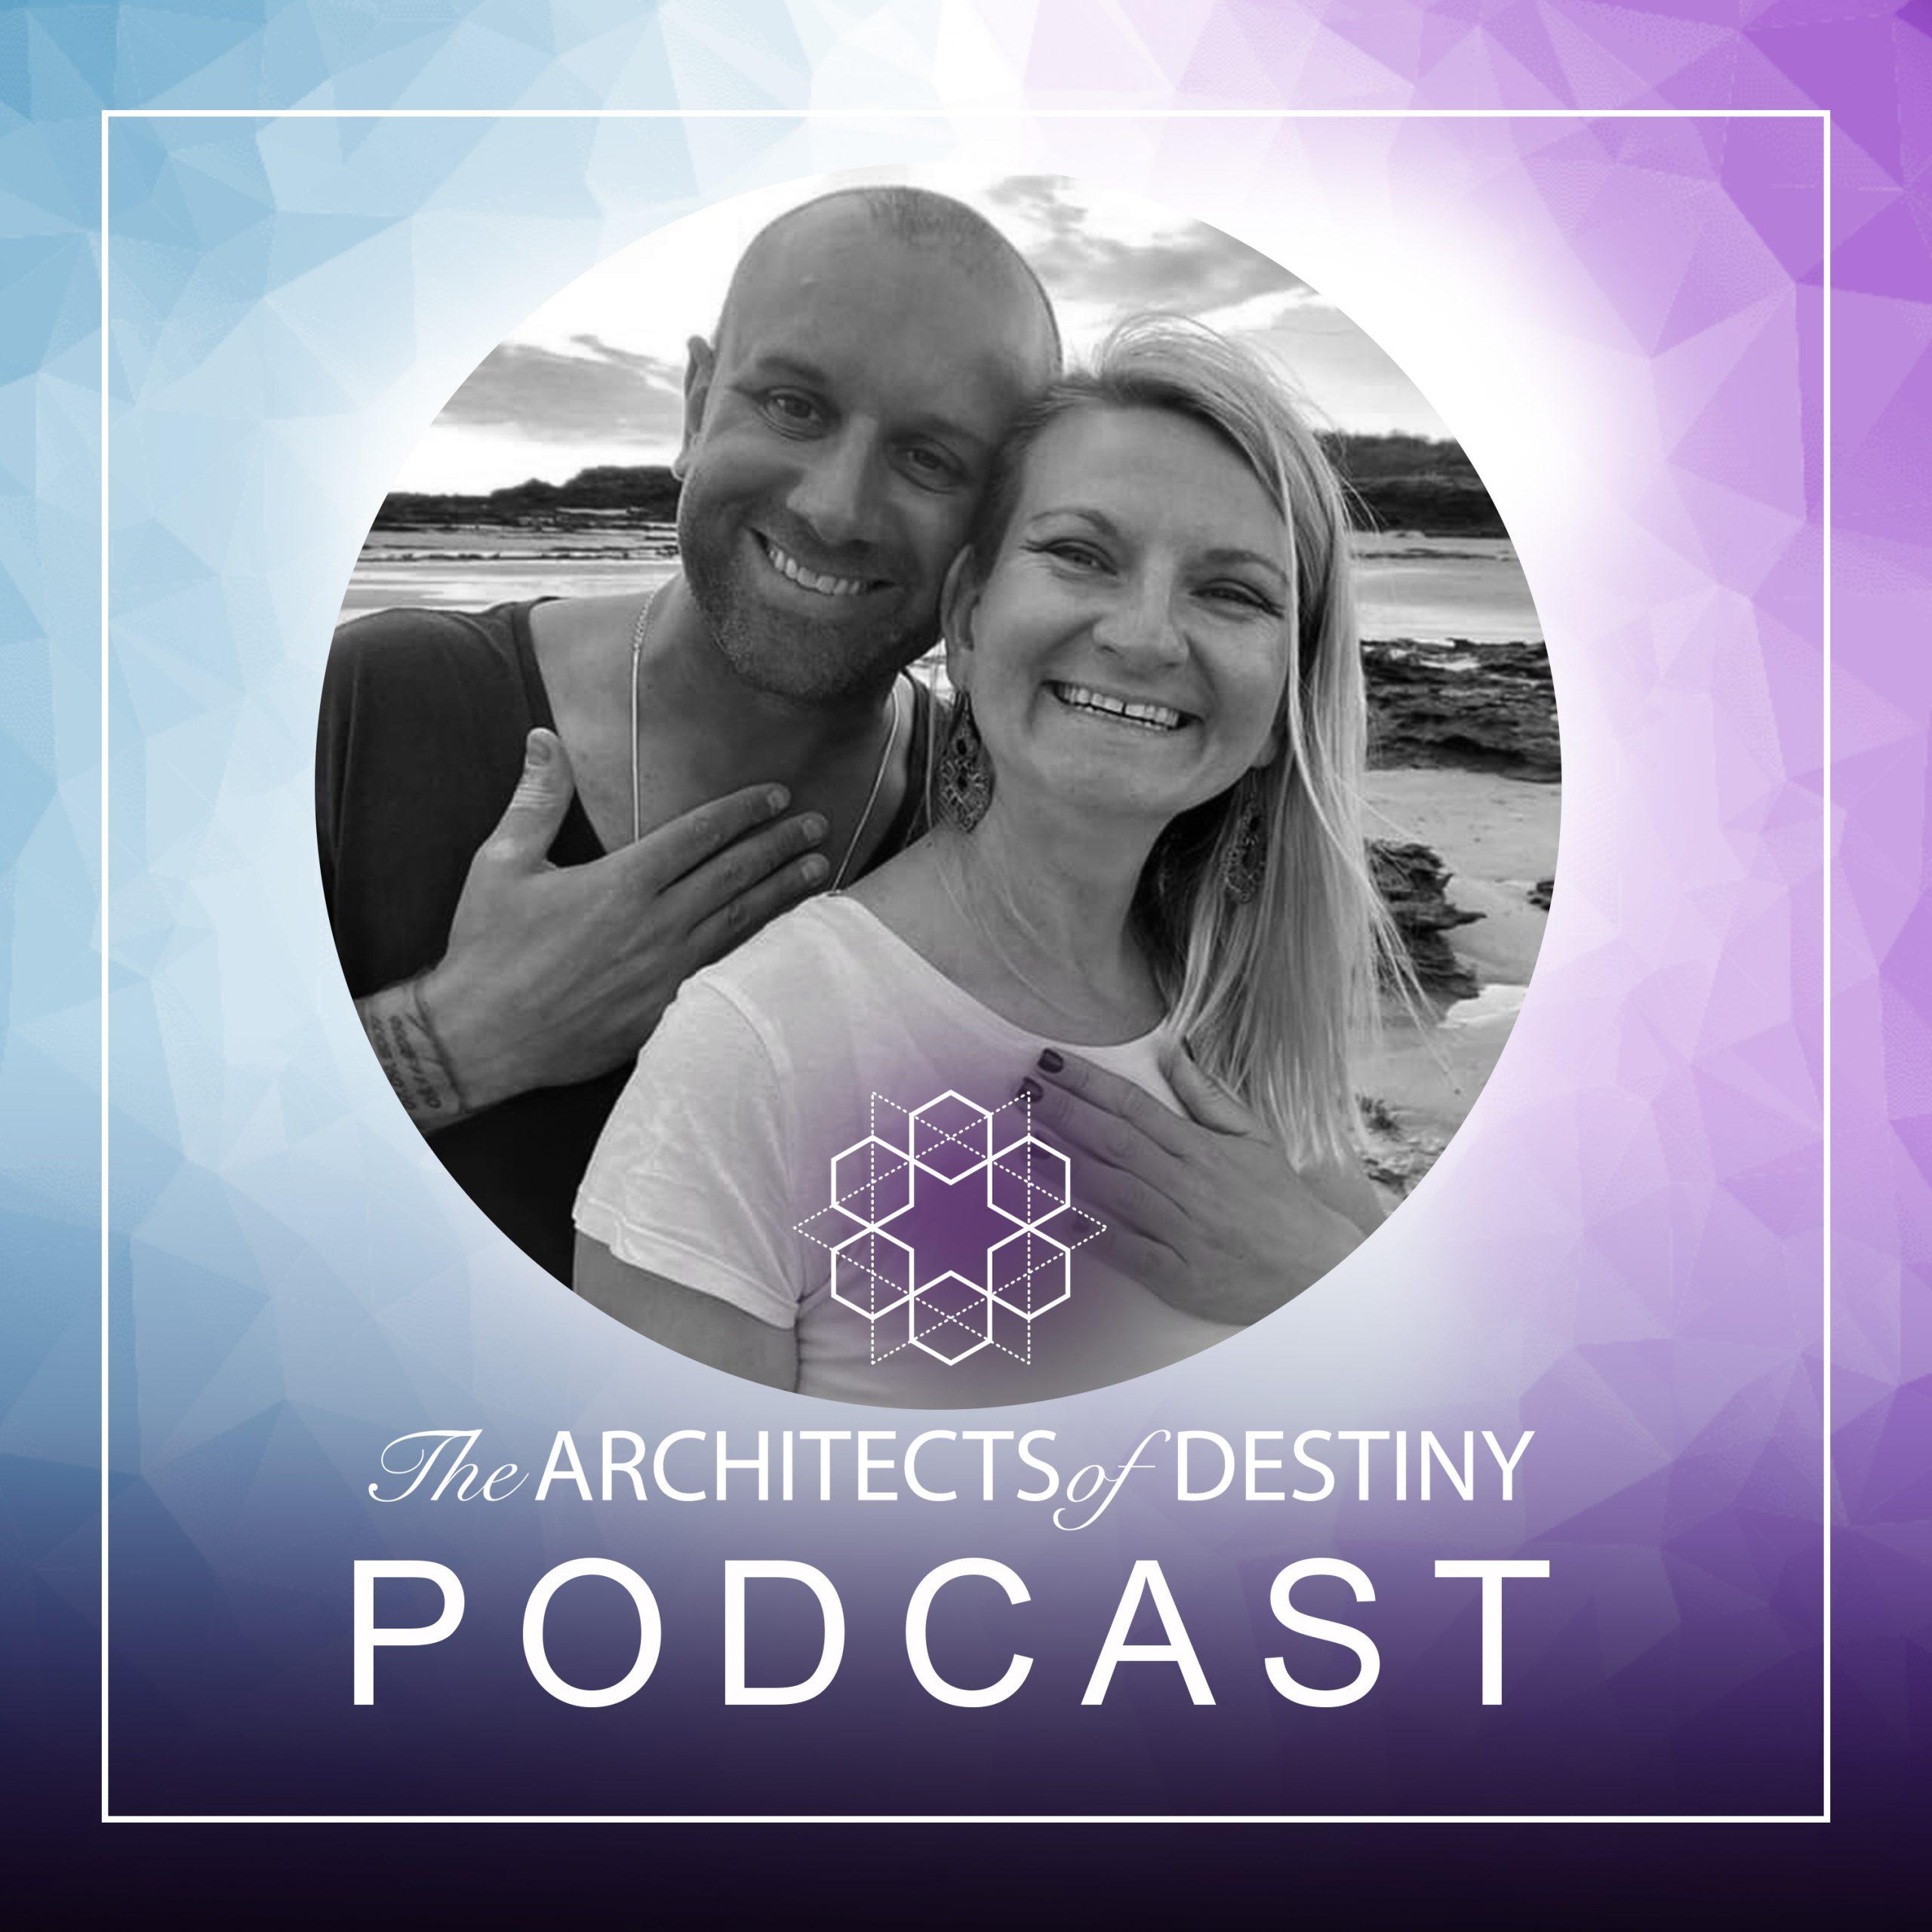 The Architects of Destiny